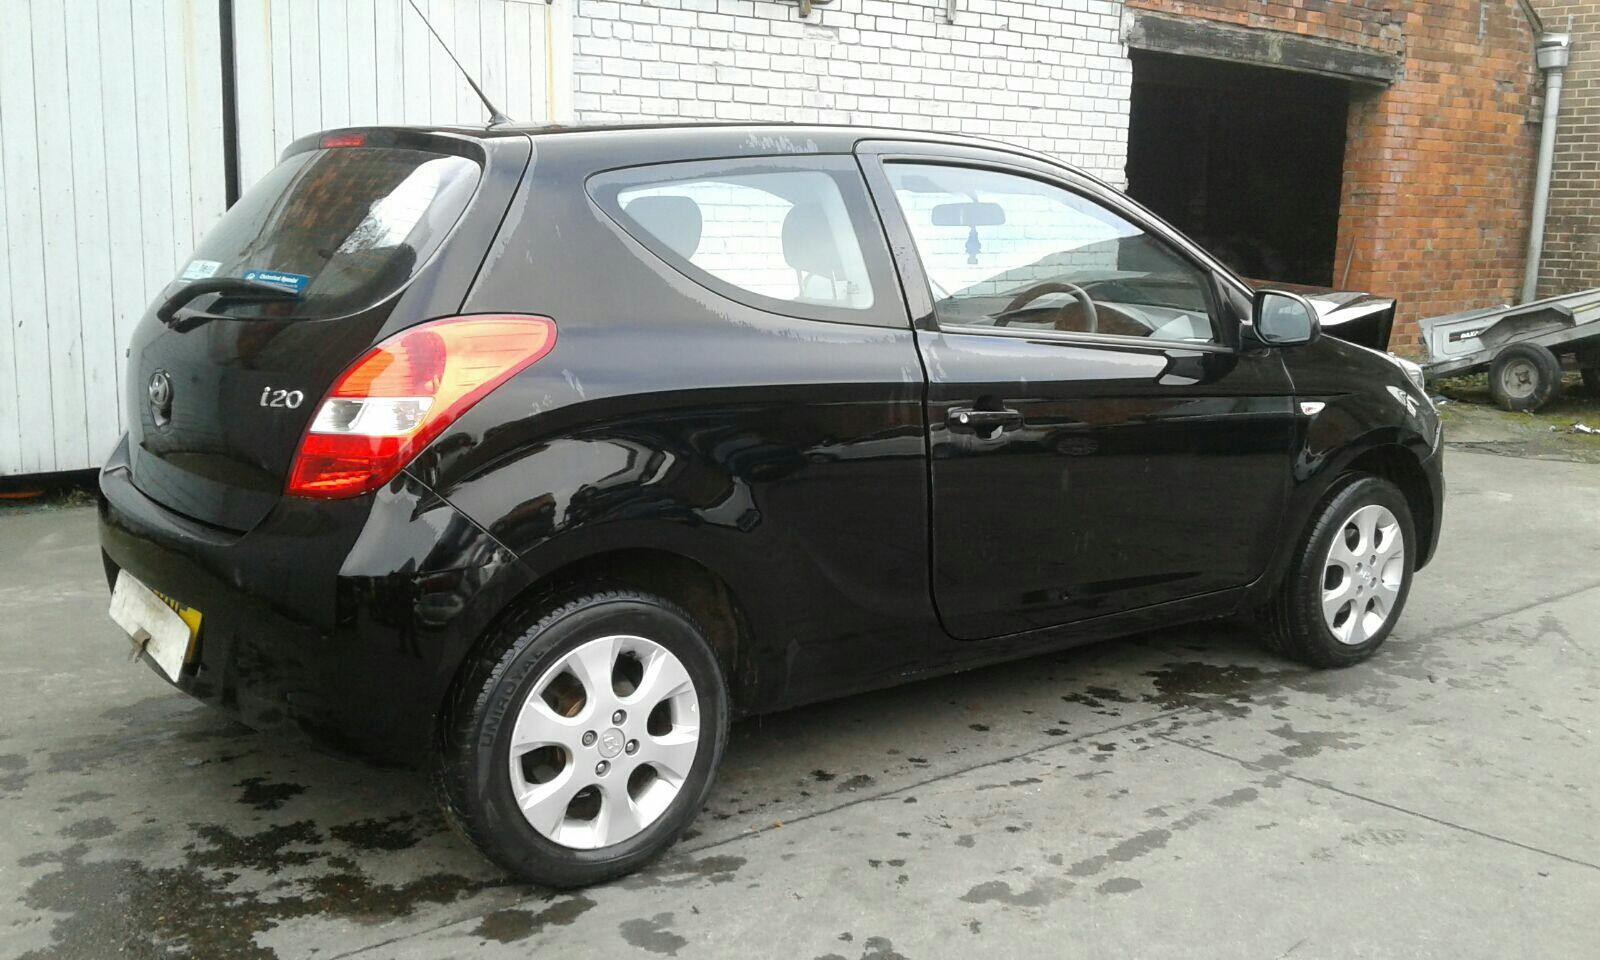 2011 Hyundai i20 2009 To 2012 3 Door Hatchback (Petrol